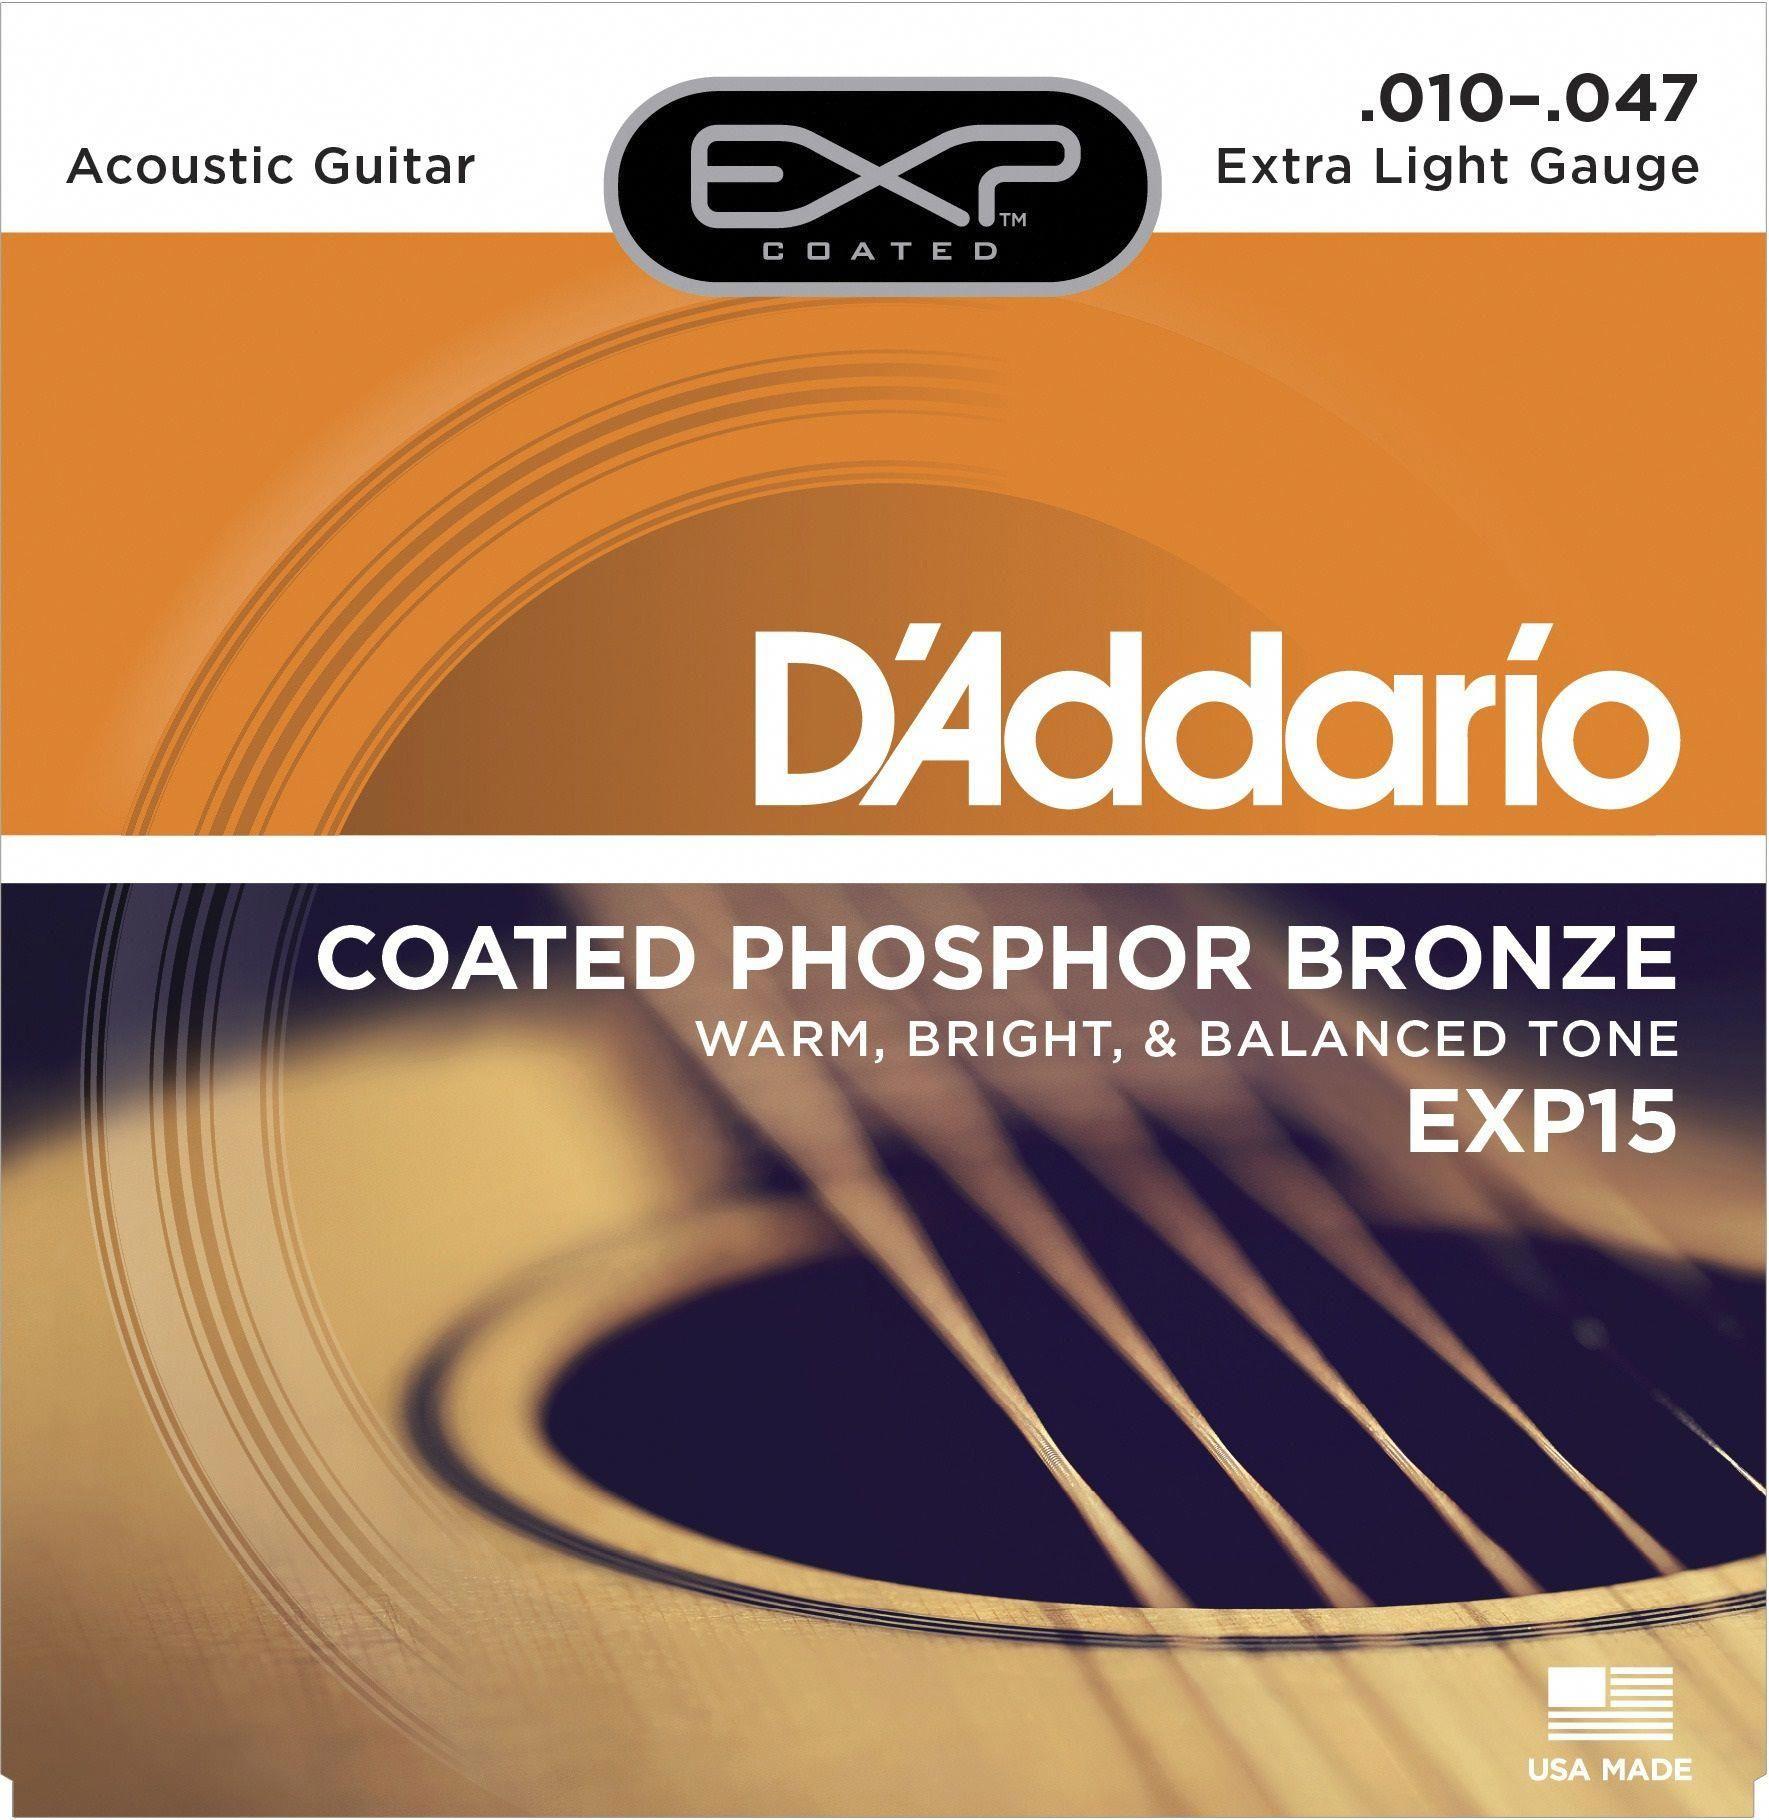 27 Superb Gretsch Guitar Stool Acoustic Guitar Strings Acoustic Guitar D Addario